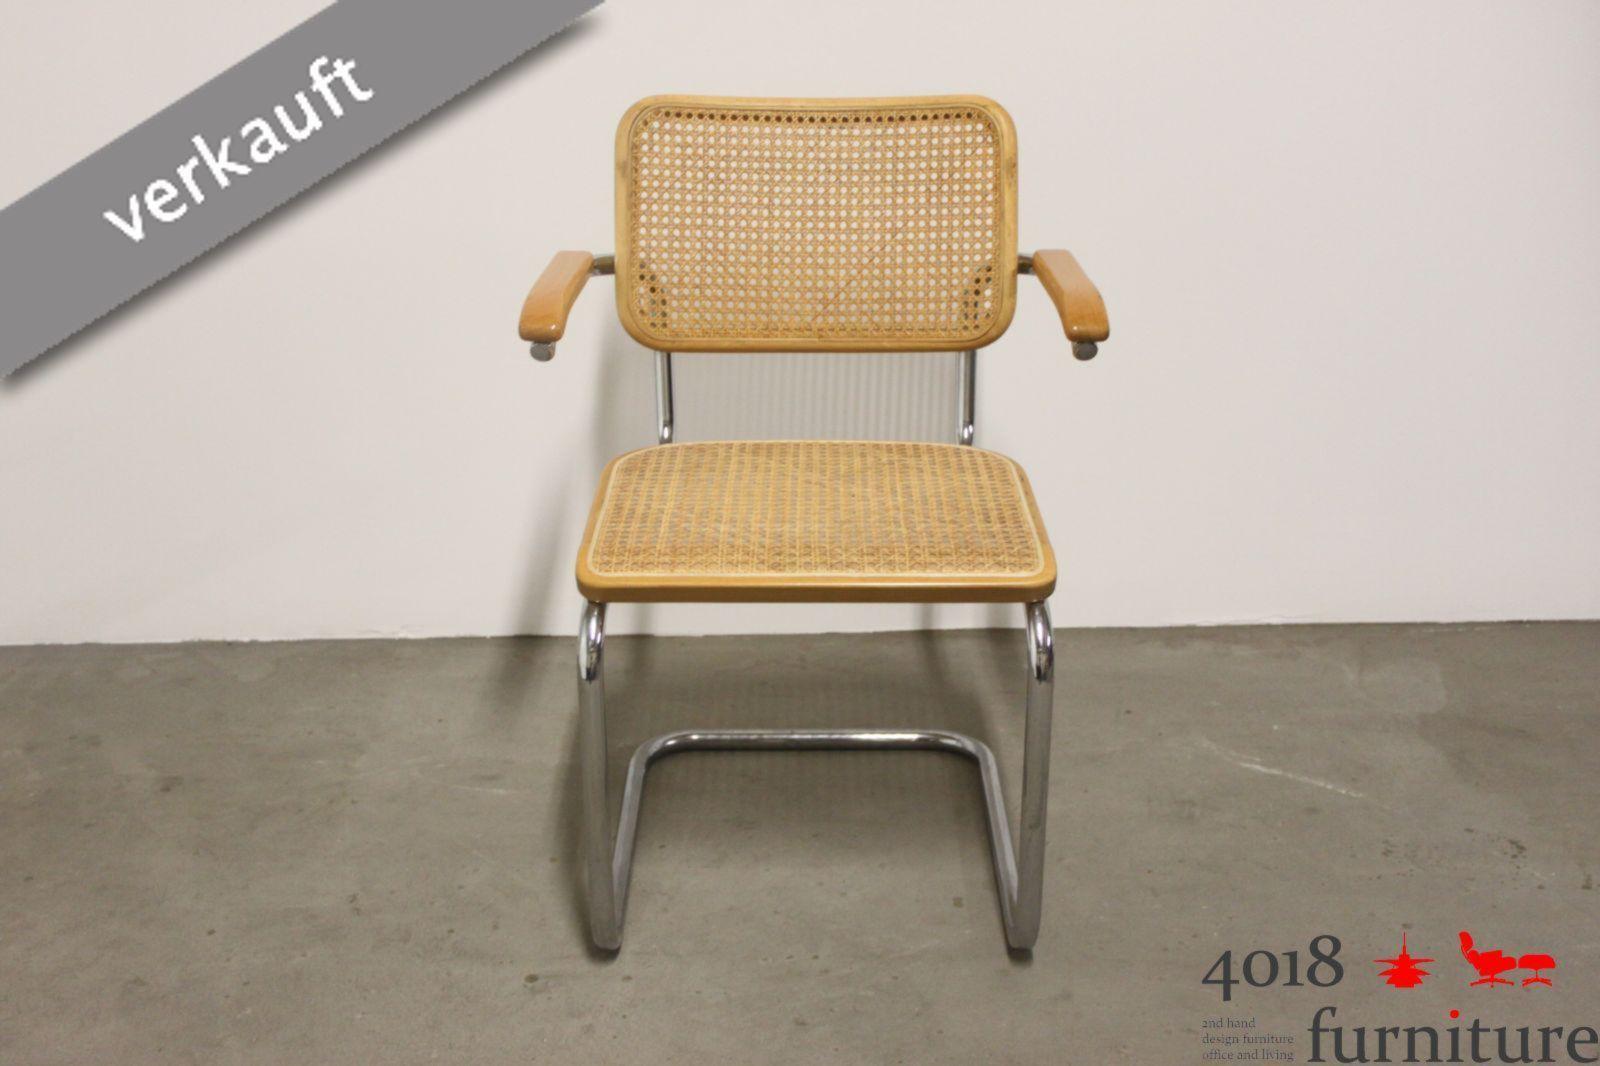 thonet s64 freischwinger buche marcel breuer mart stam. Black Bedroom Furniture Sets. Home Design Ideas